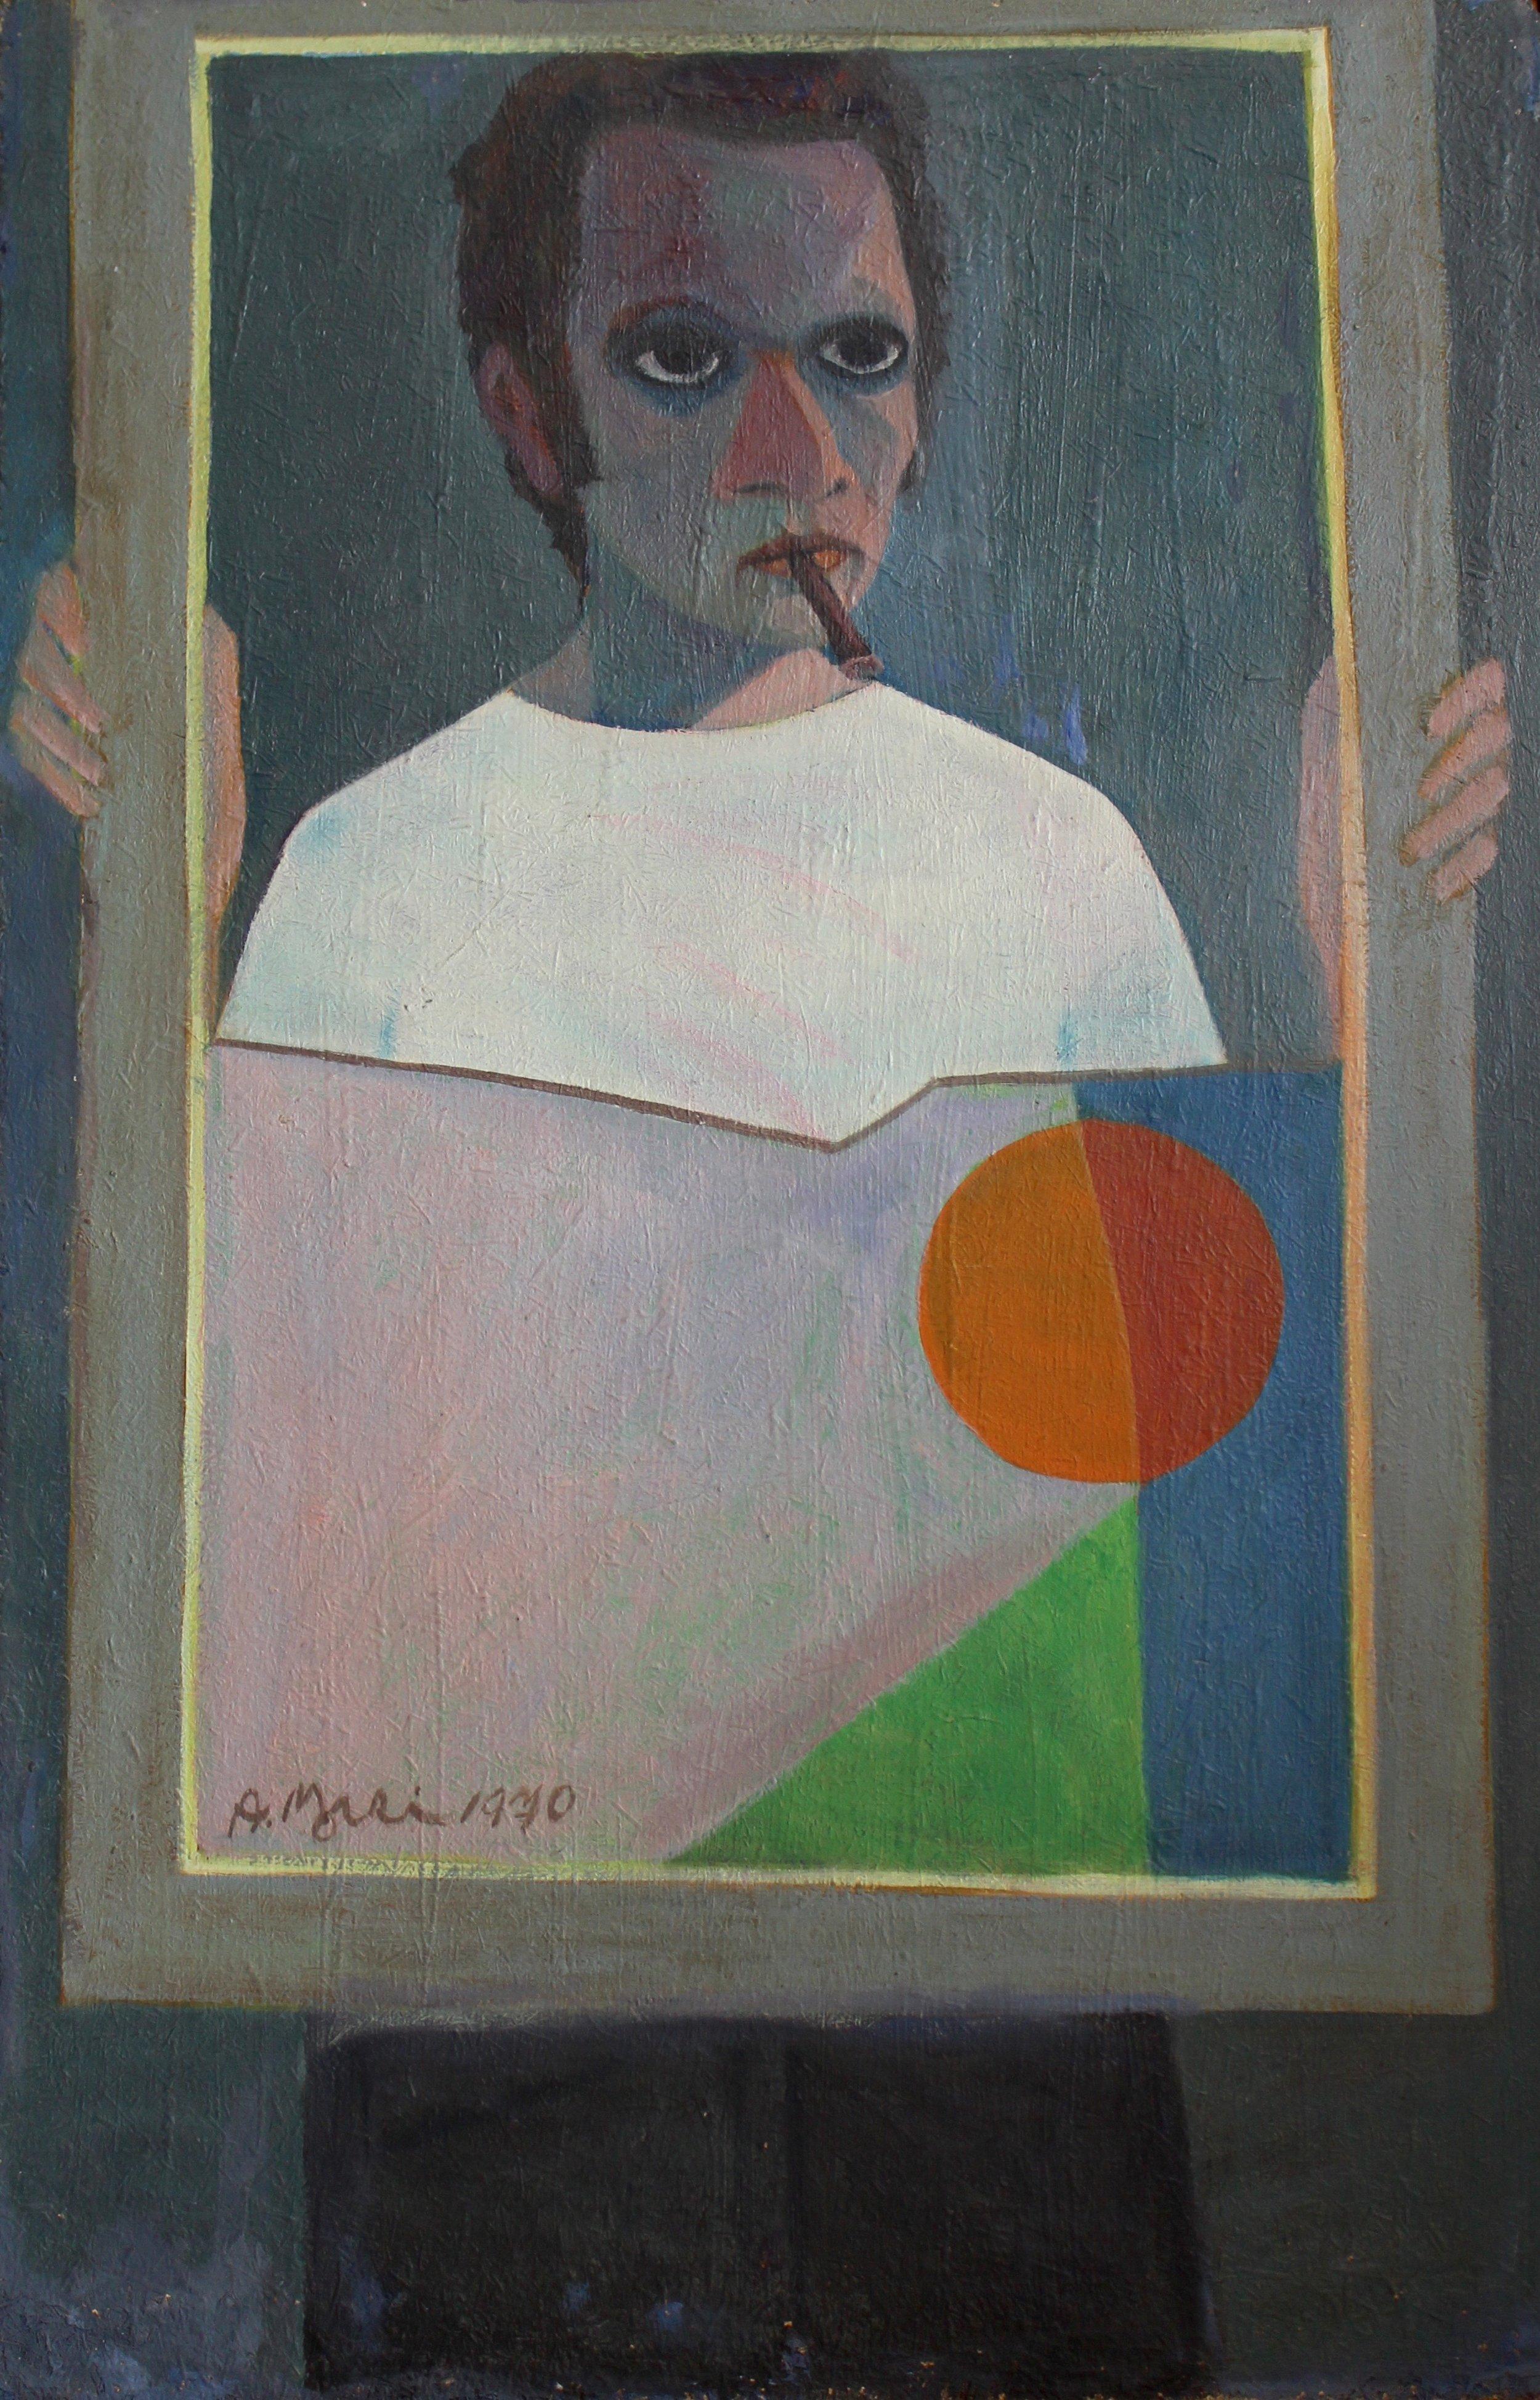 Ahmed-Morsi-Self-Portrait-1970.jpg